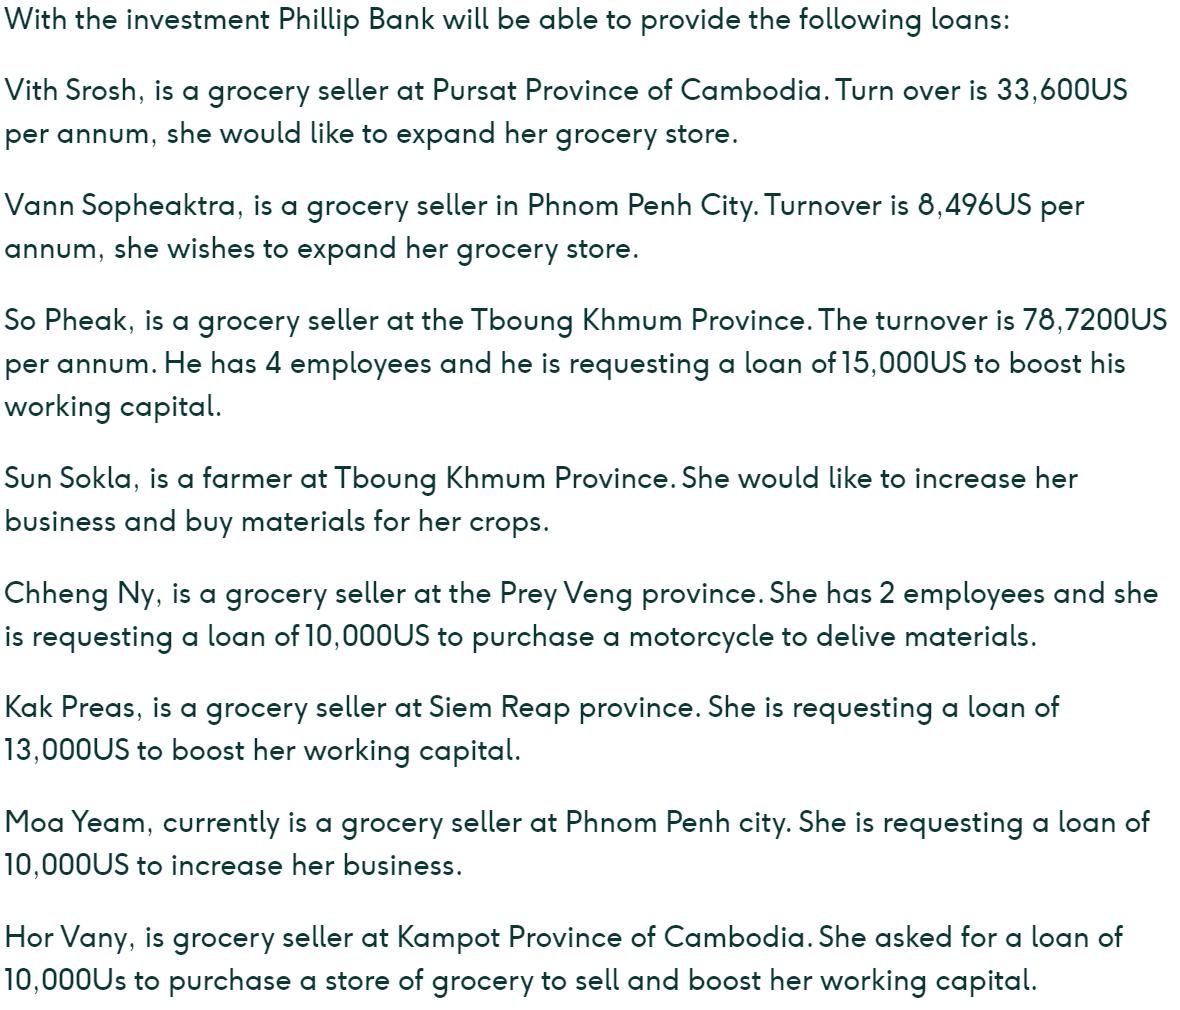 Example of the investor description on Lendahand